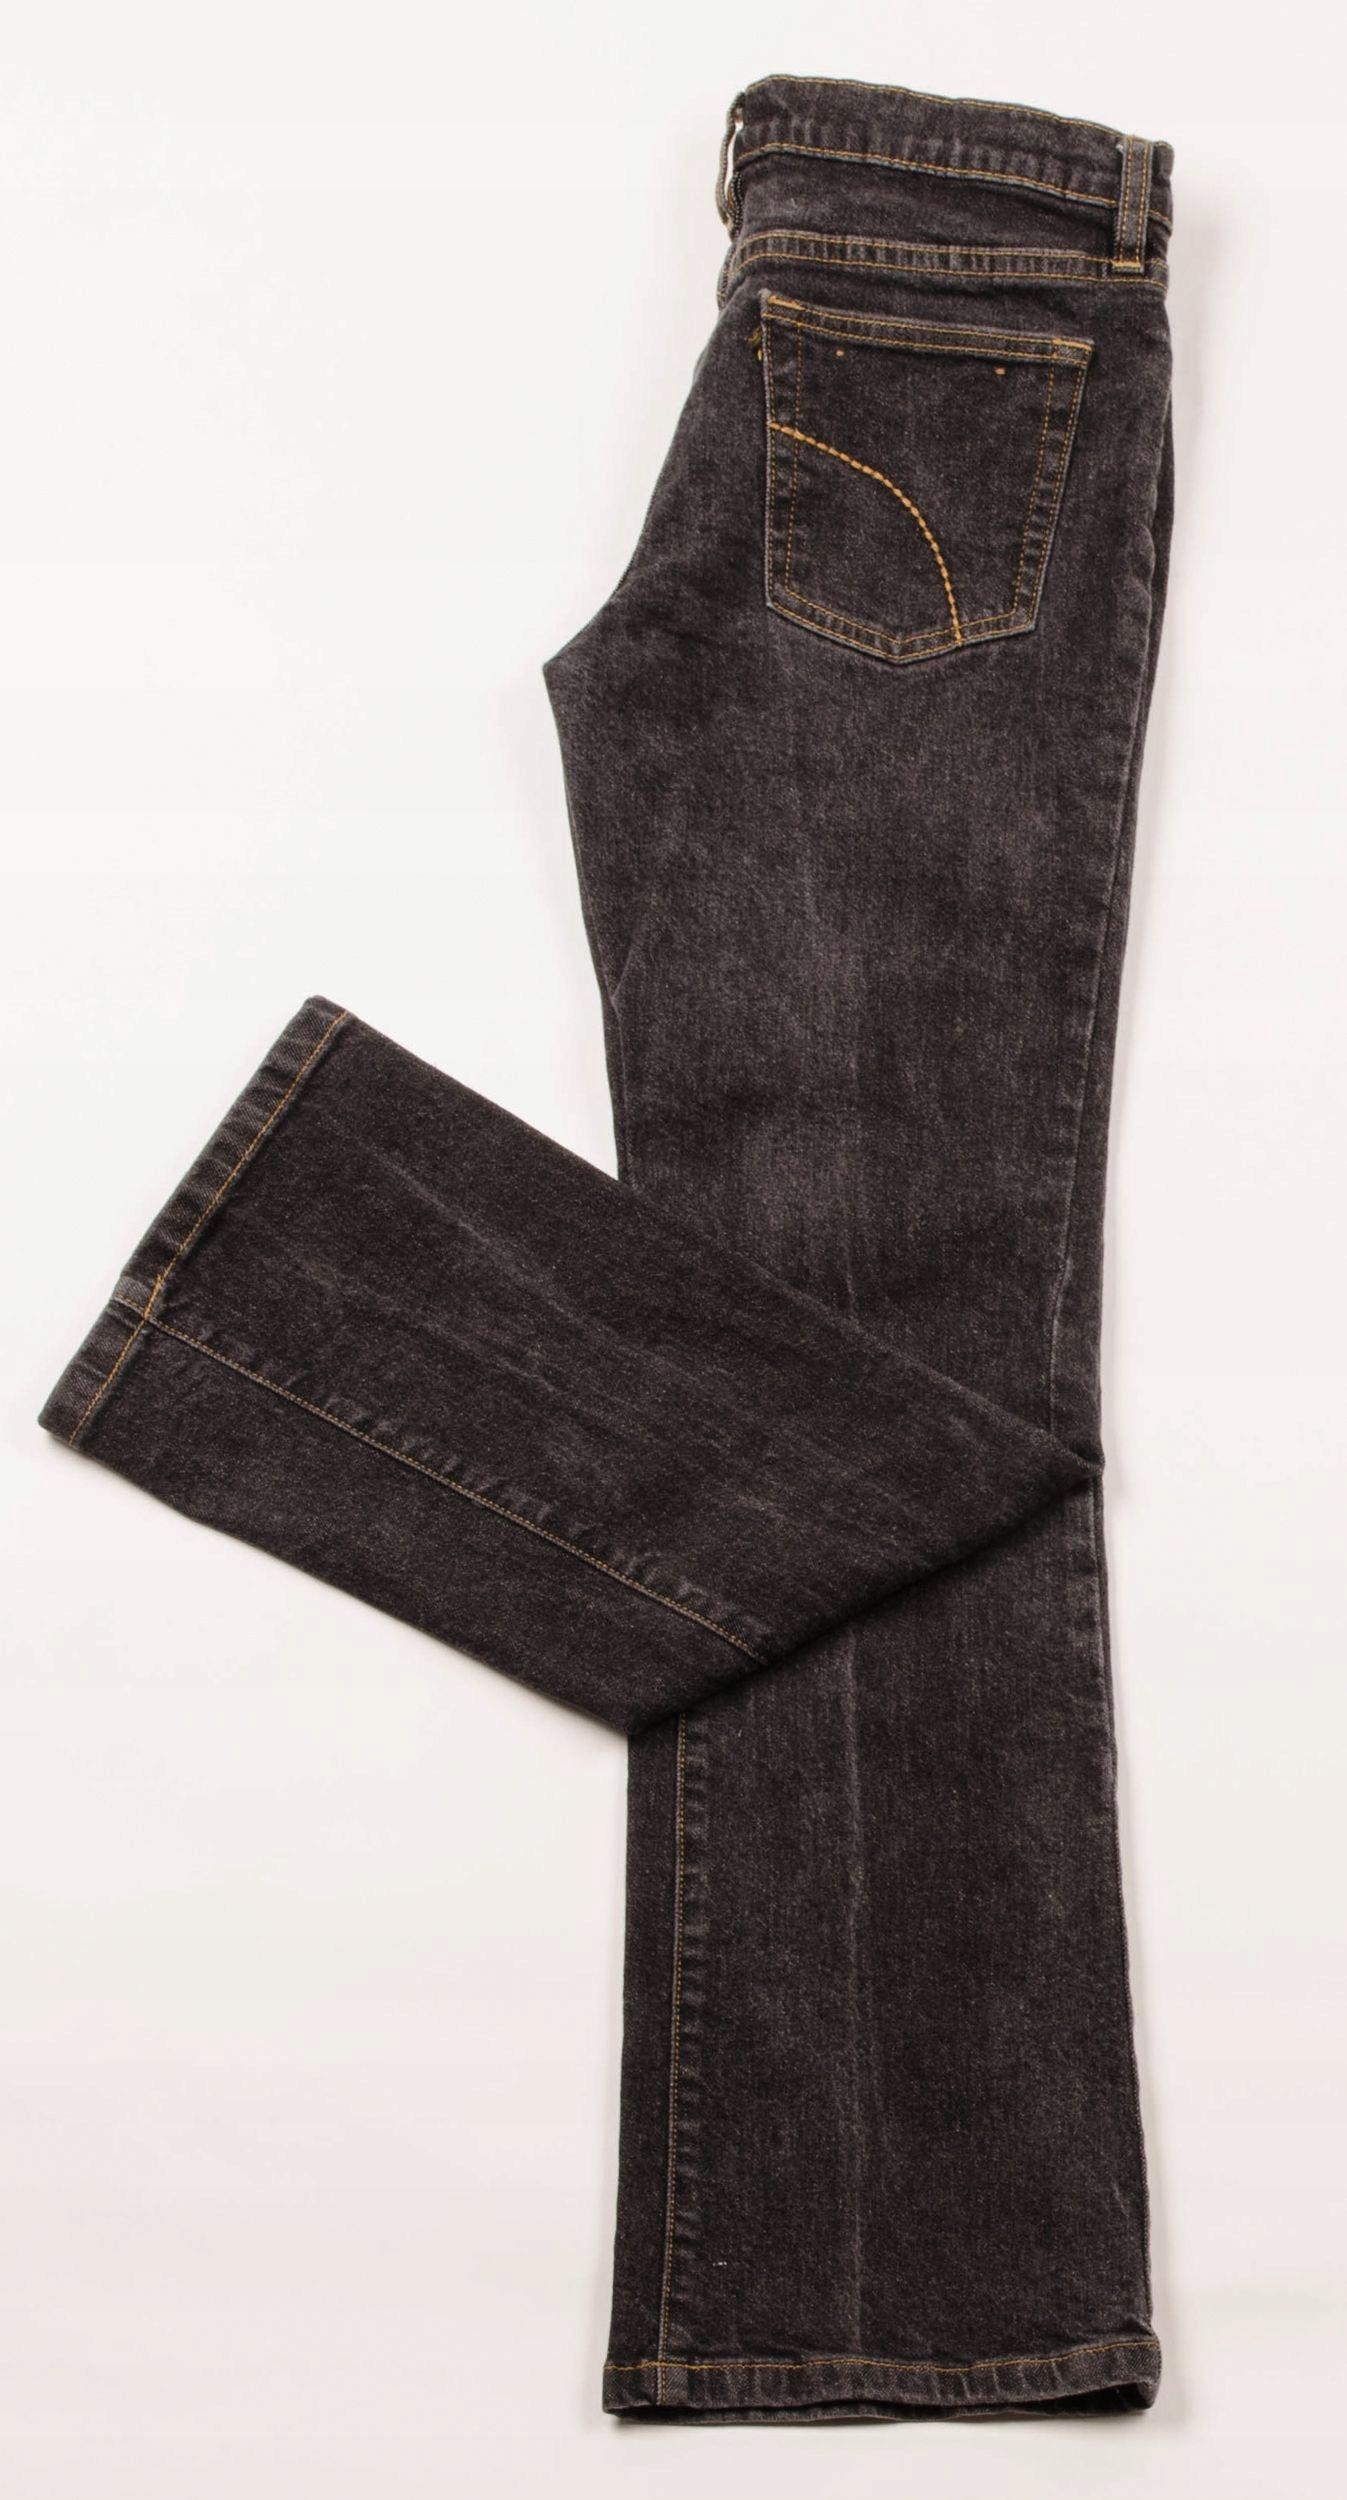 22201 Tommy Hilfiger Spodnie Damskie S